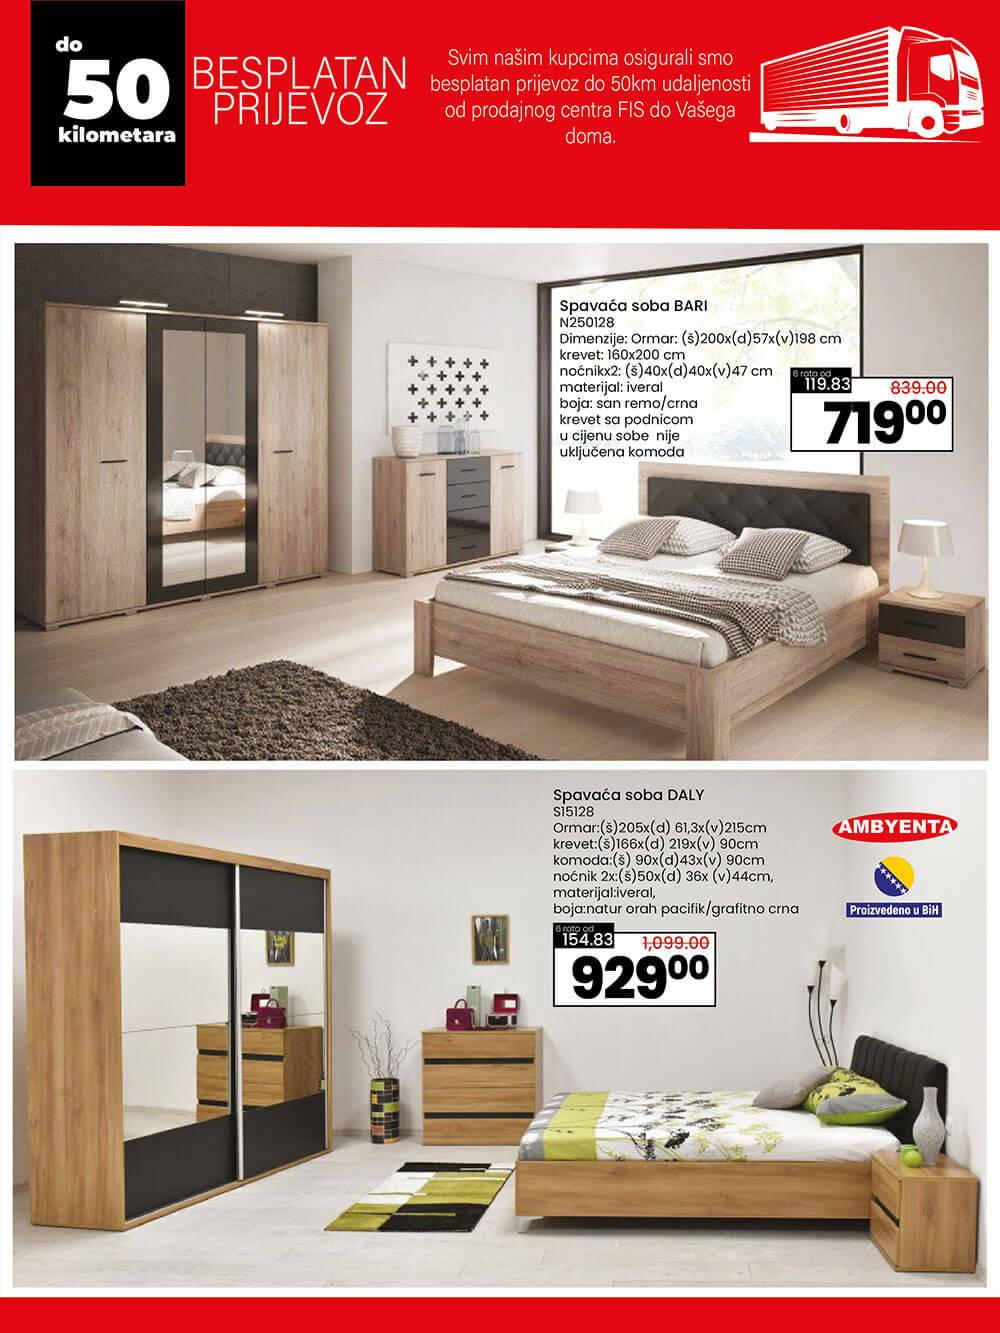 FIS Akcijski Katalog JUN 2021 eKatalozi.com 04.06. 23.06. 32